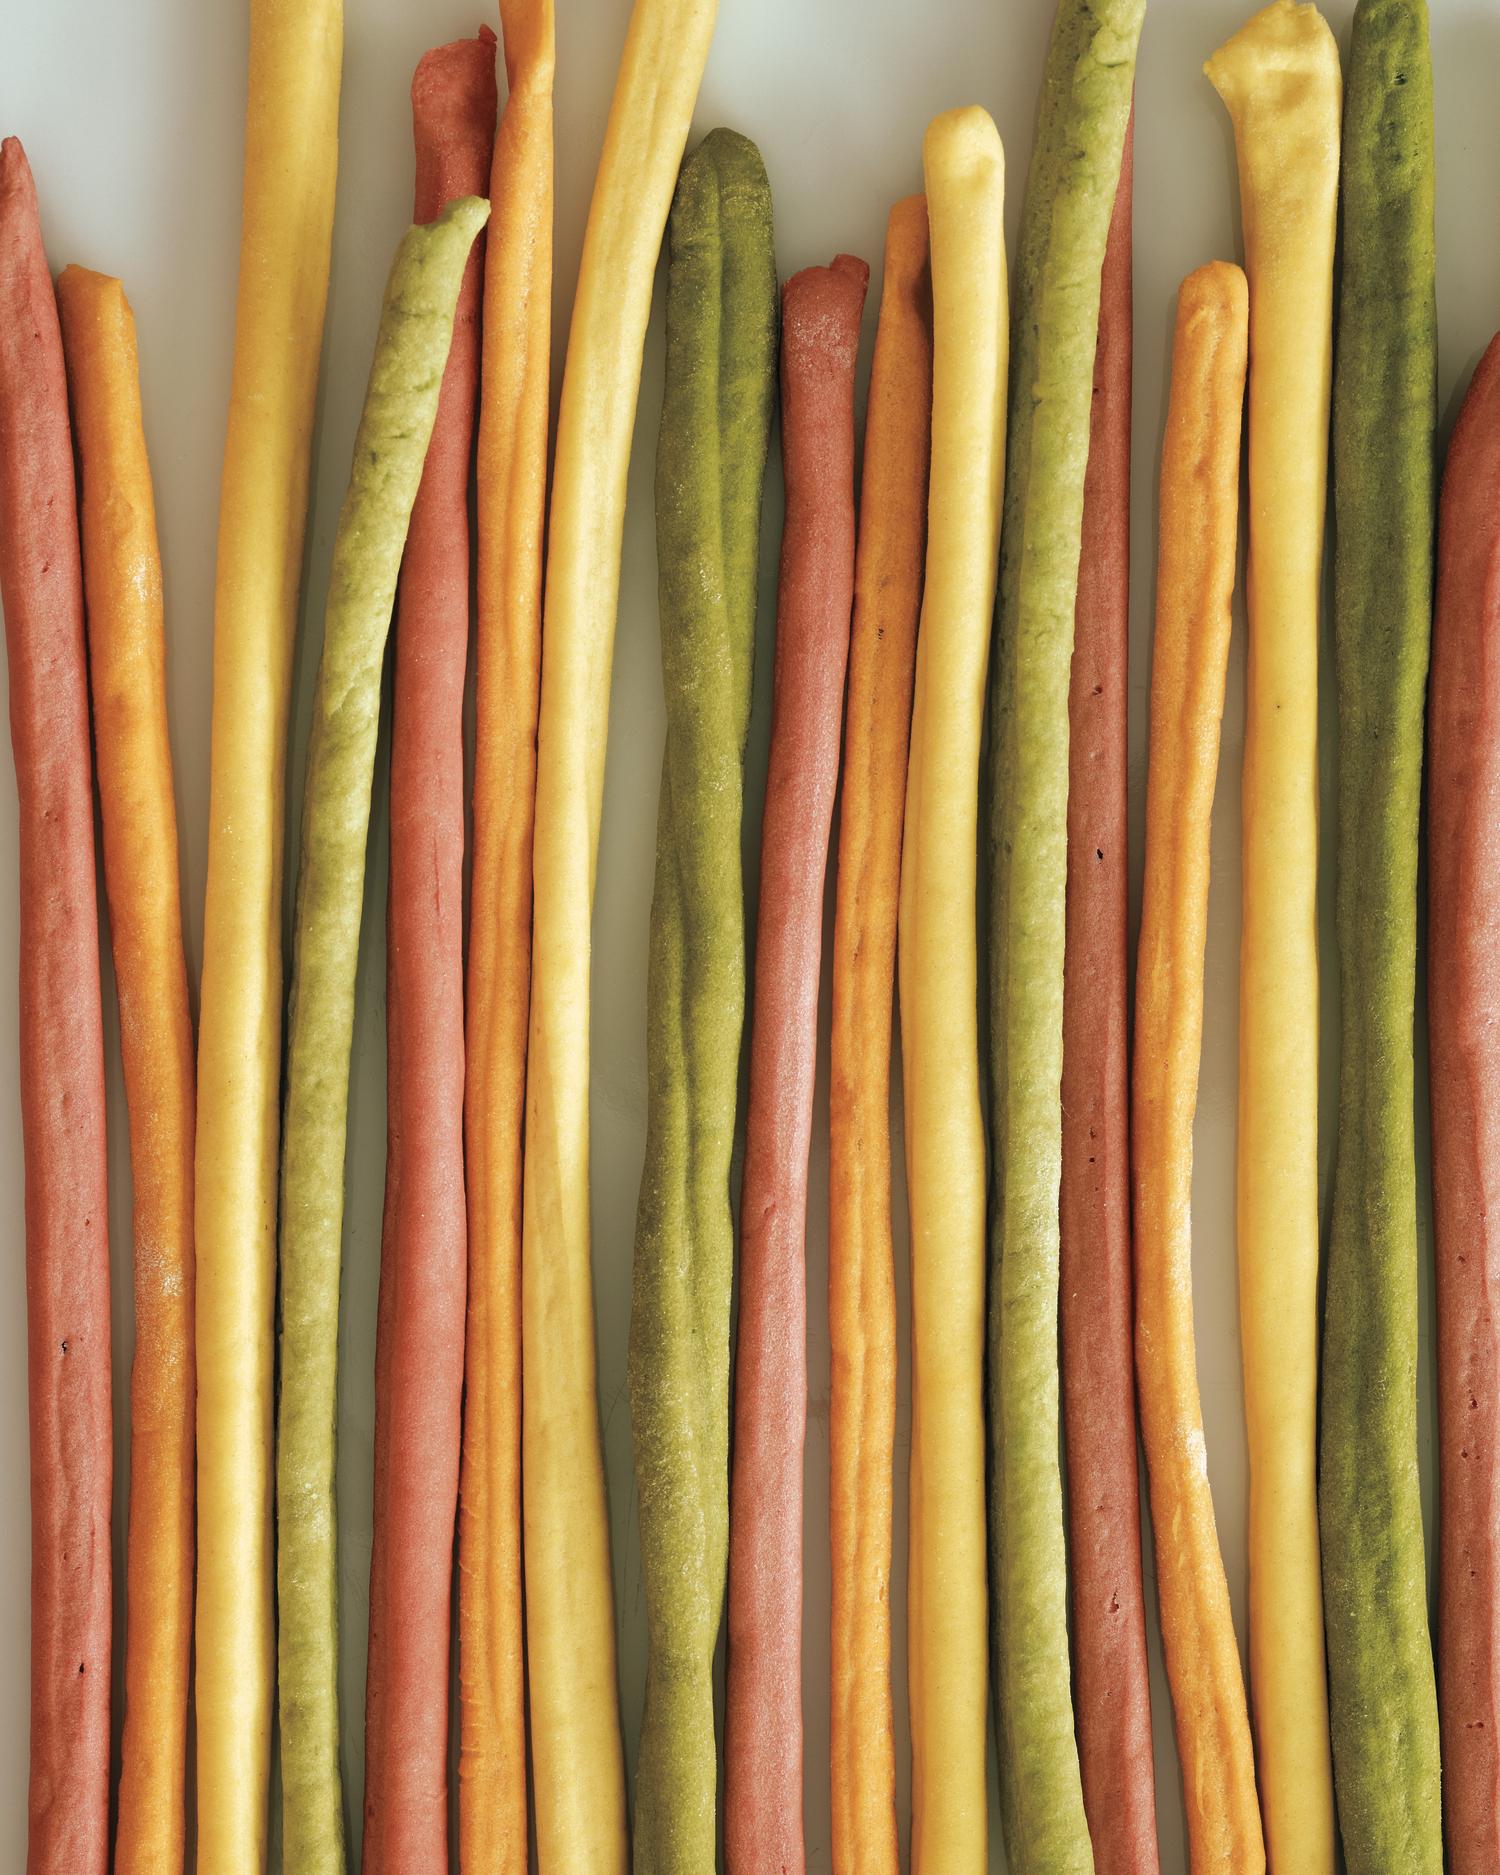 Classic Breadsticks